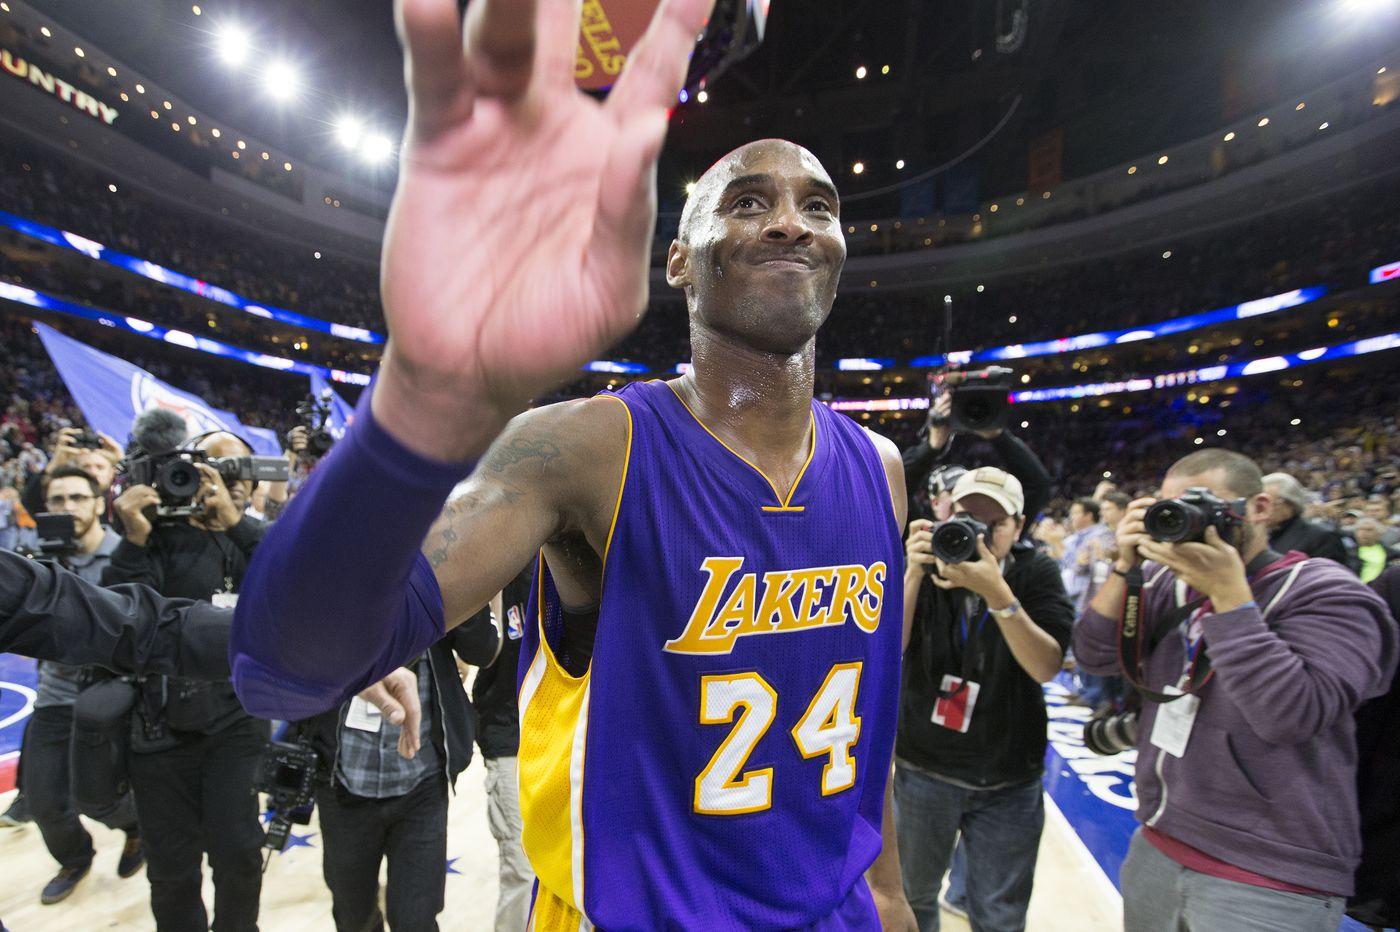 Kobe Bryant's death stuns Sixers: Brett Brown, Joel Embiid share memories and tributes